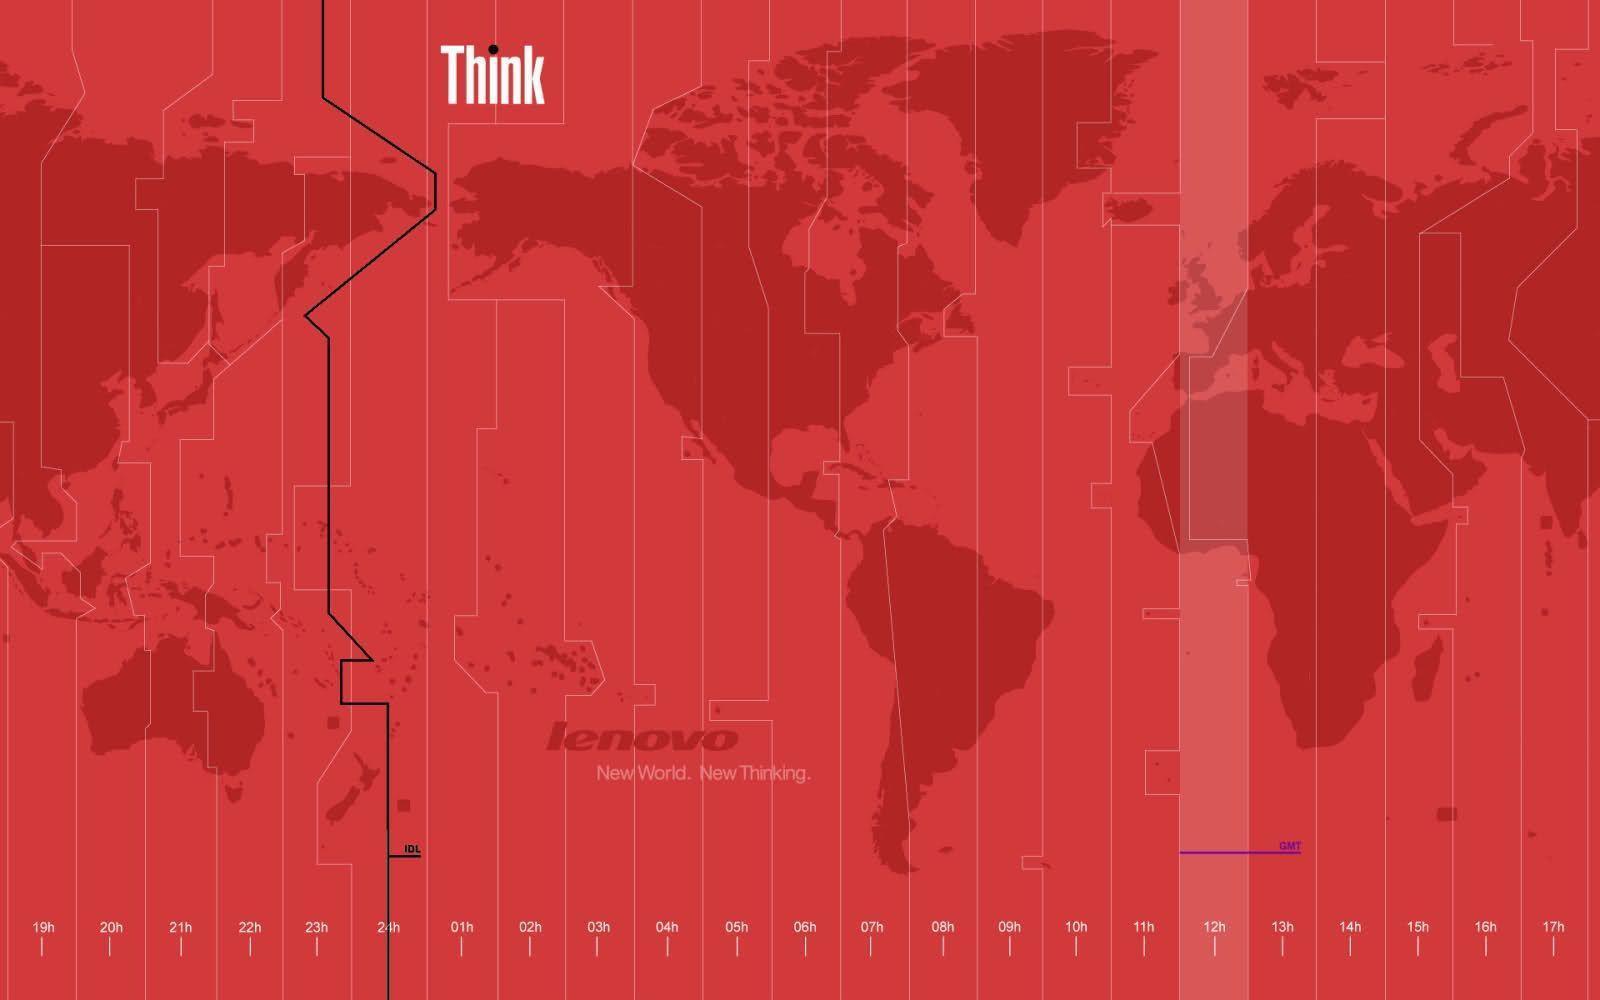 Lenovo Red Wallpaper: Lenovo ThinkPad Wallpapers